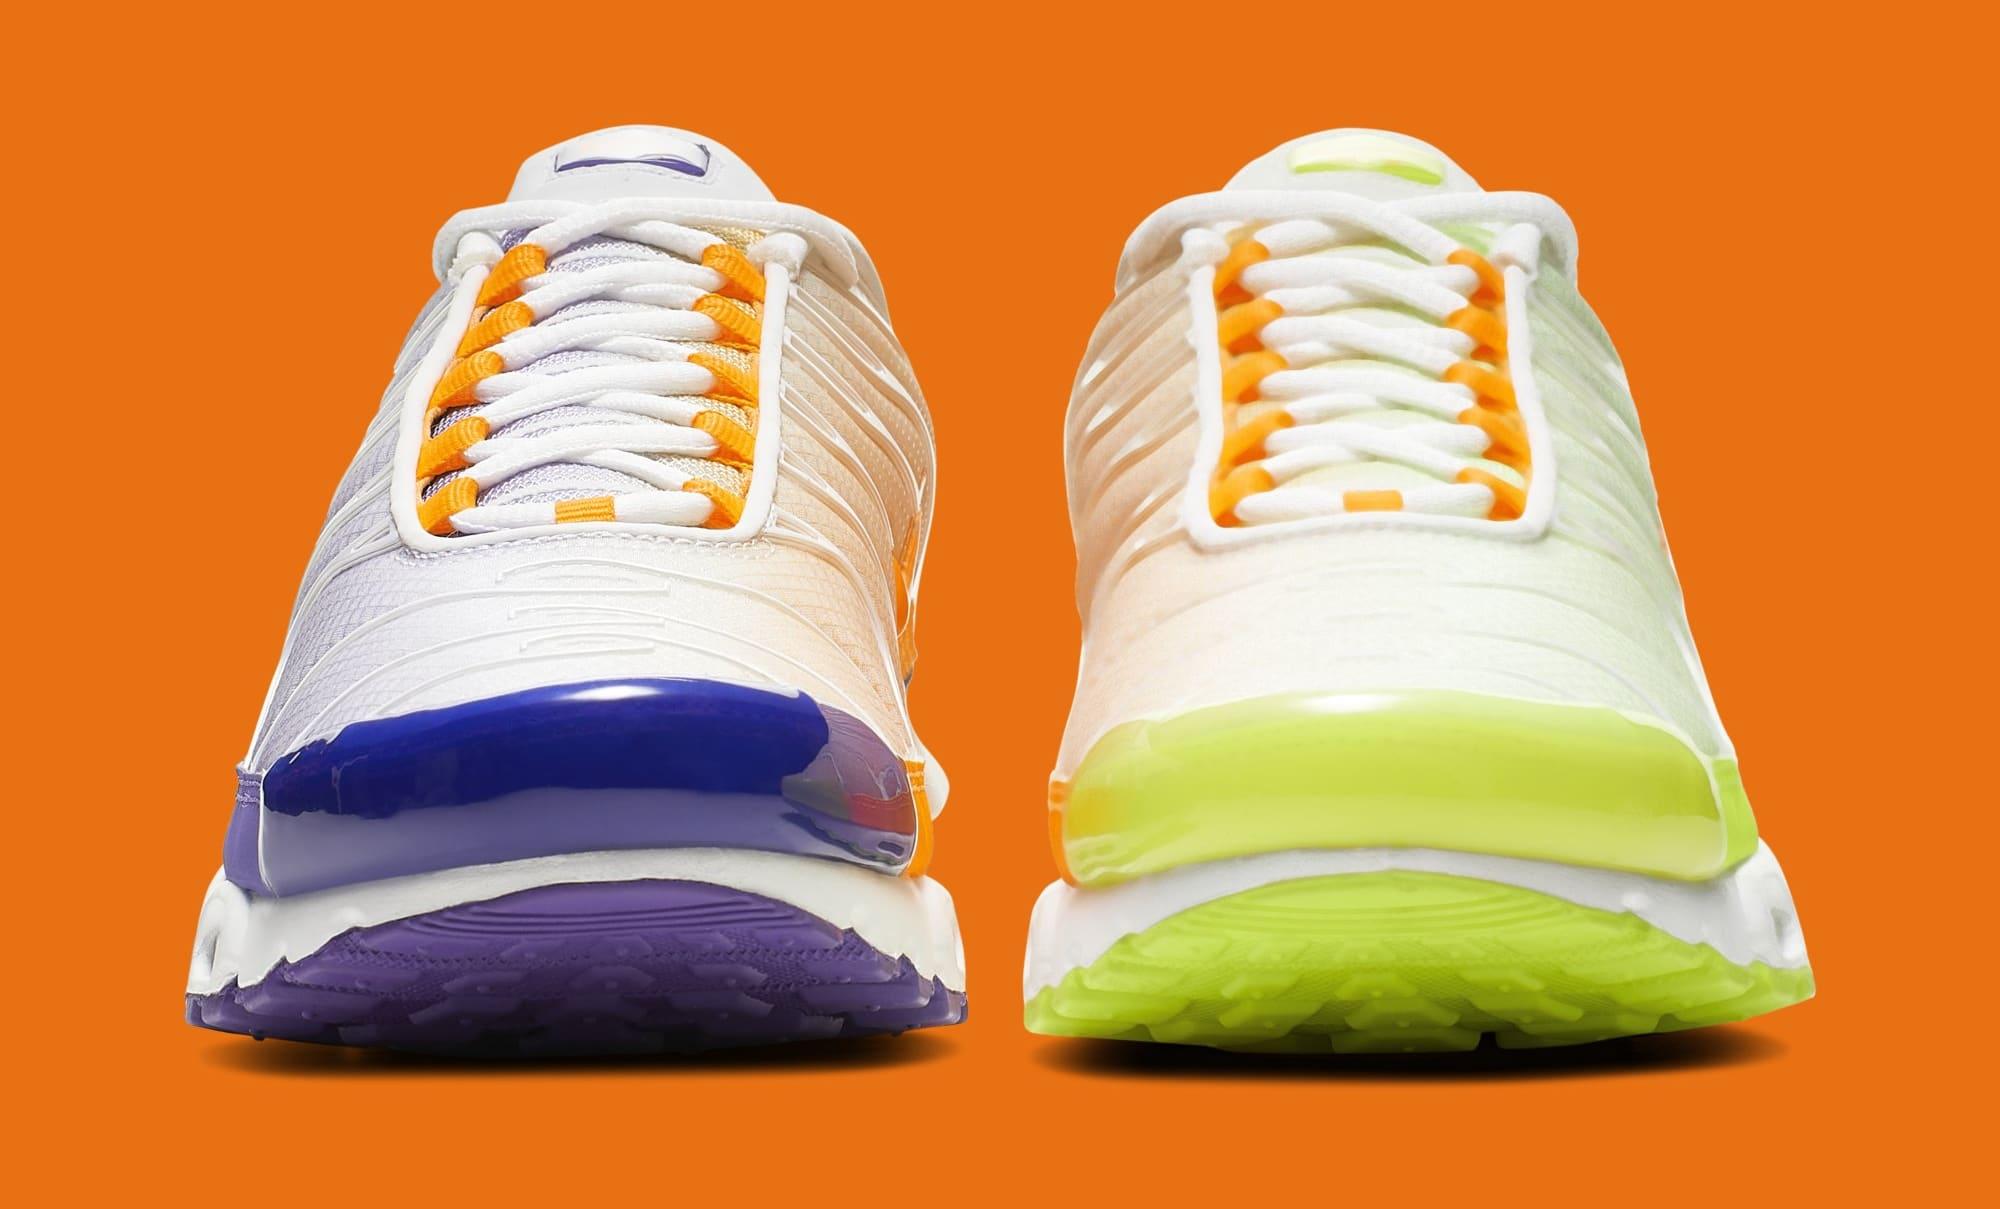 Nike Air Max Plus 'Color Flip/White' CI5925-531 (Toe)